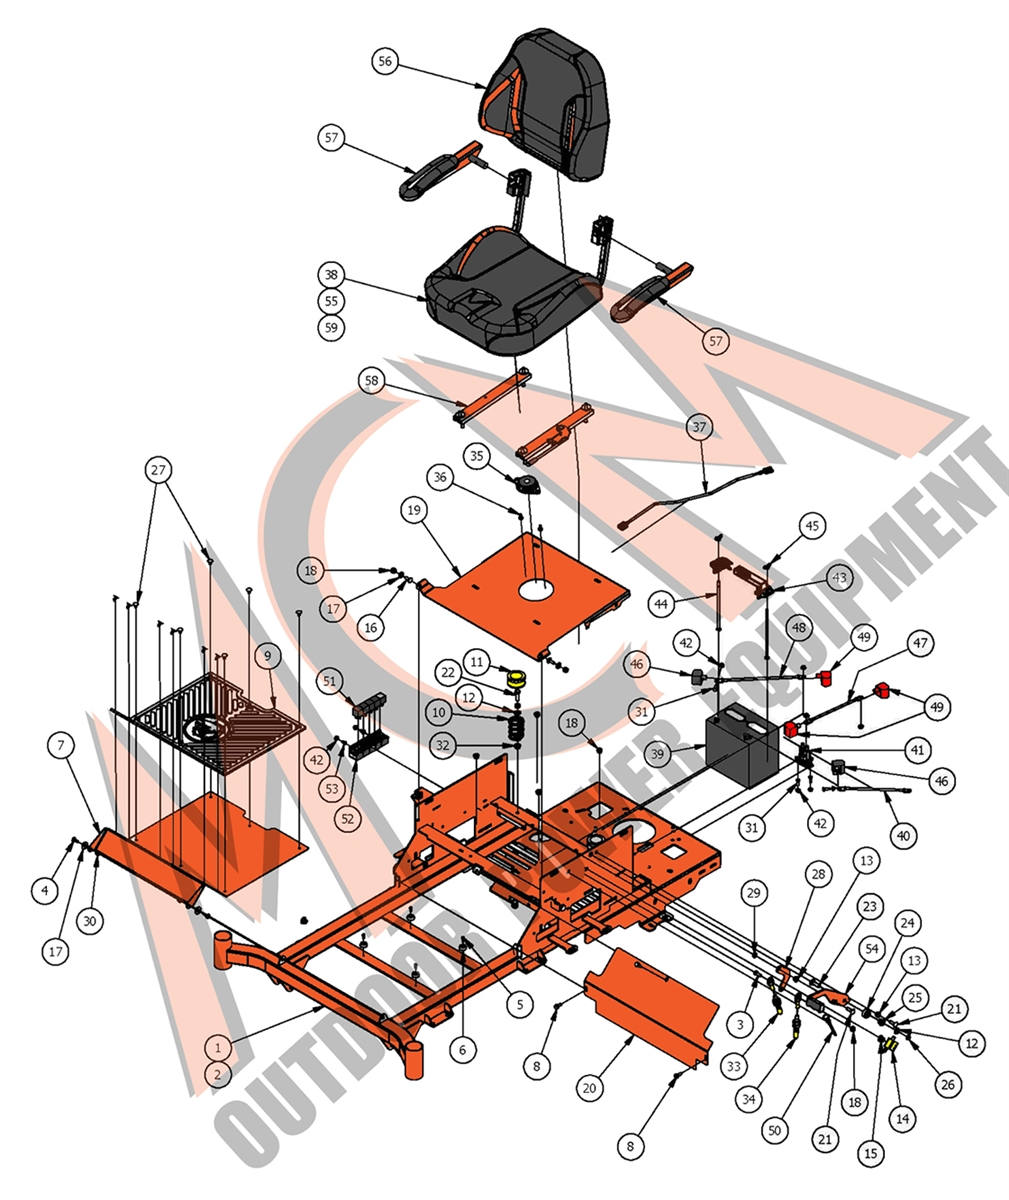 Bad Boy Mower Part, 2017 ZT ELITE SEAT FRAME EMBLY Bad Boy Mower Wiring Diagram on